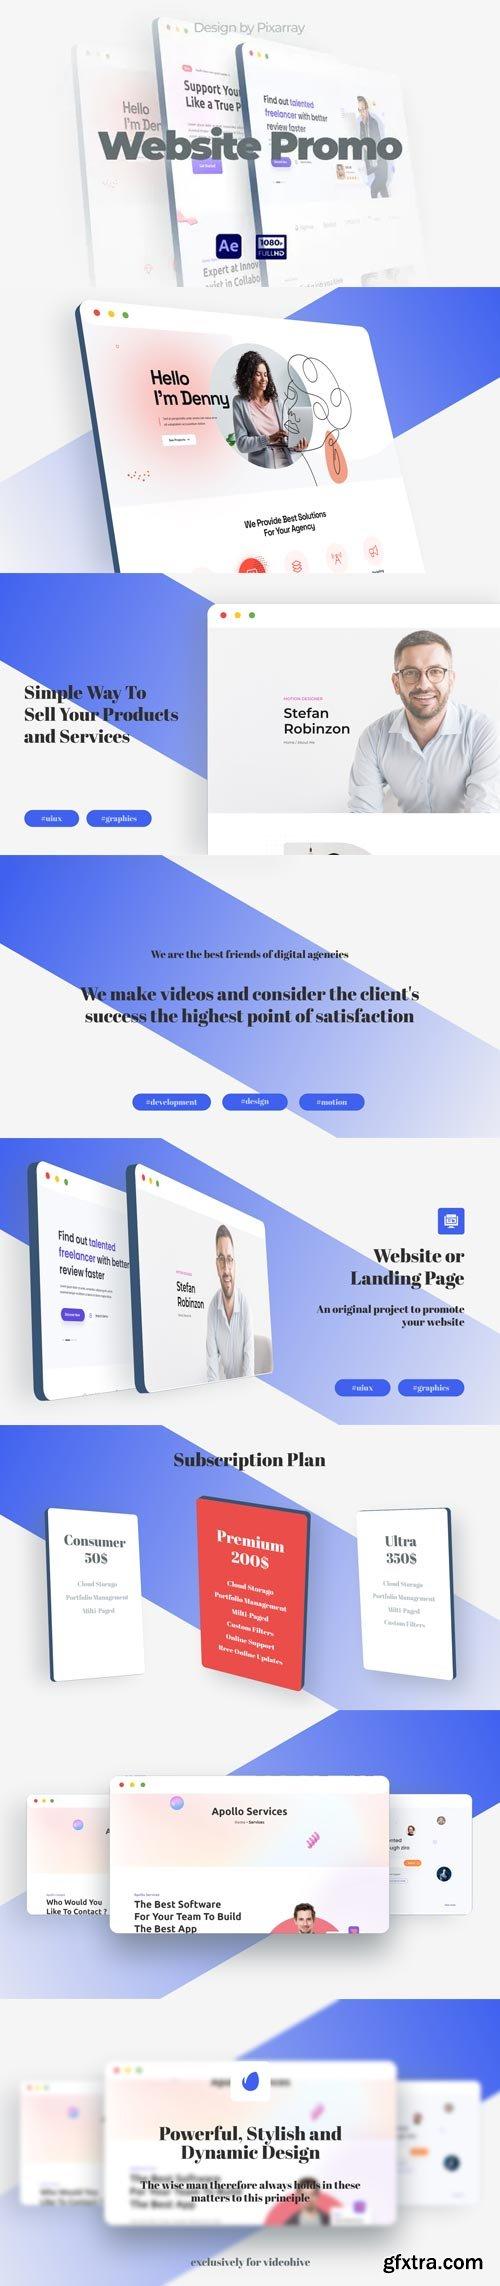 Videohive - Website Promo Presentation - 32334345